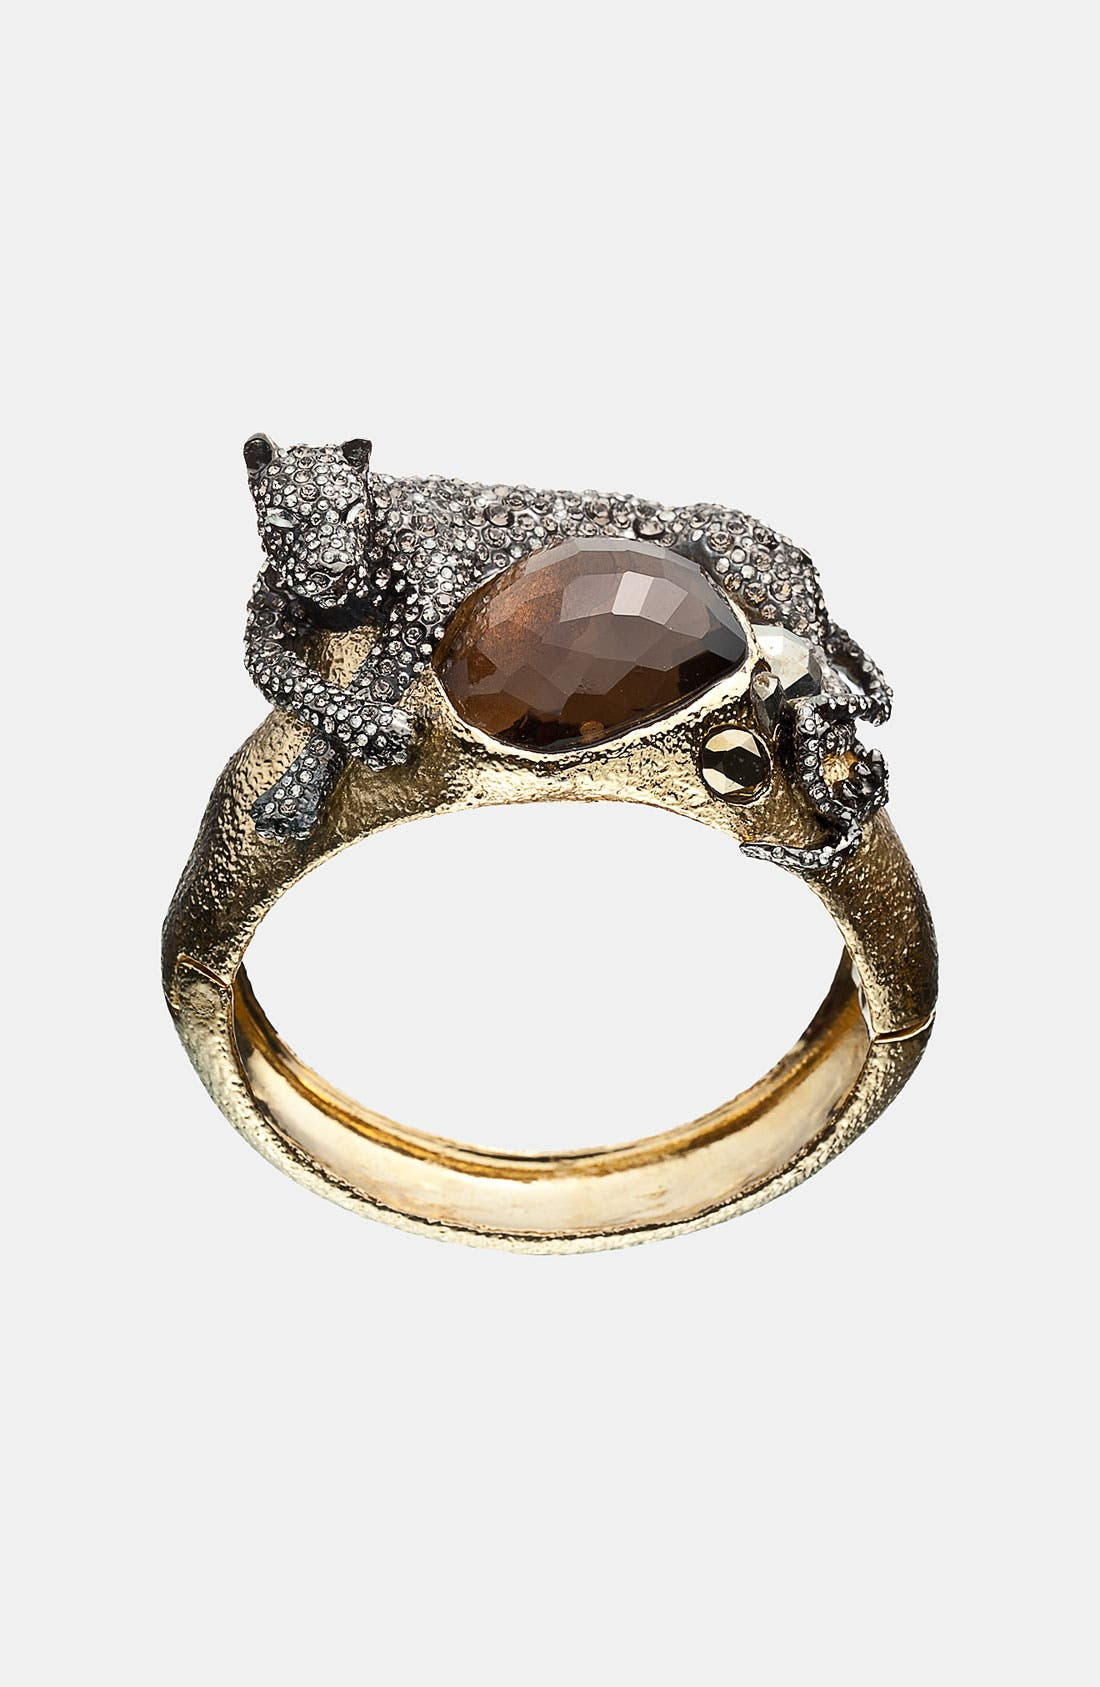 Main Image - Alexis Bittar 'Elements - Siyabona' Large Panther Hinged Bracelet